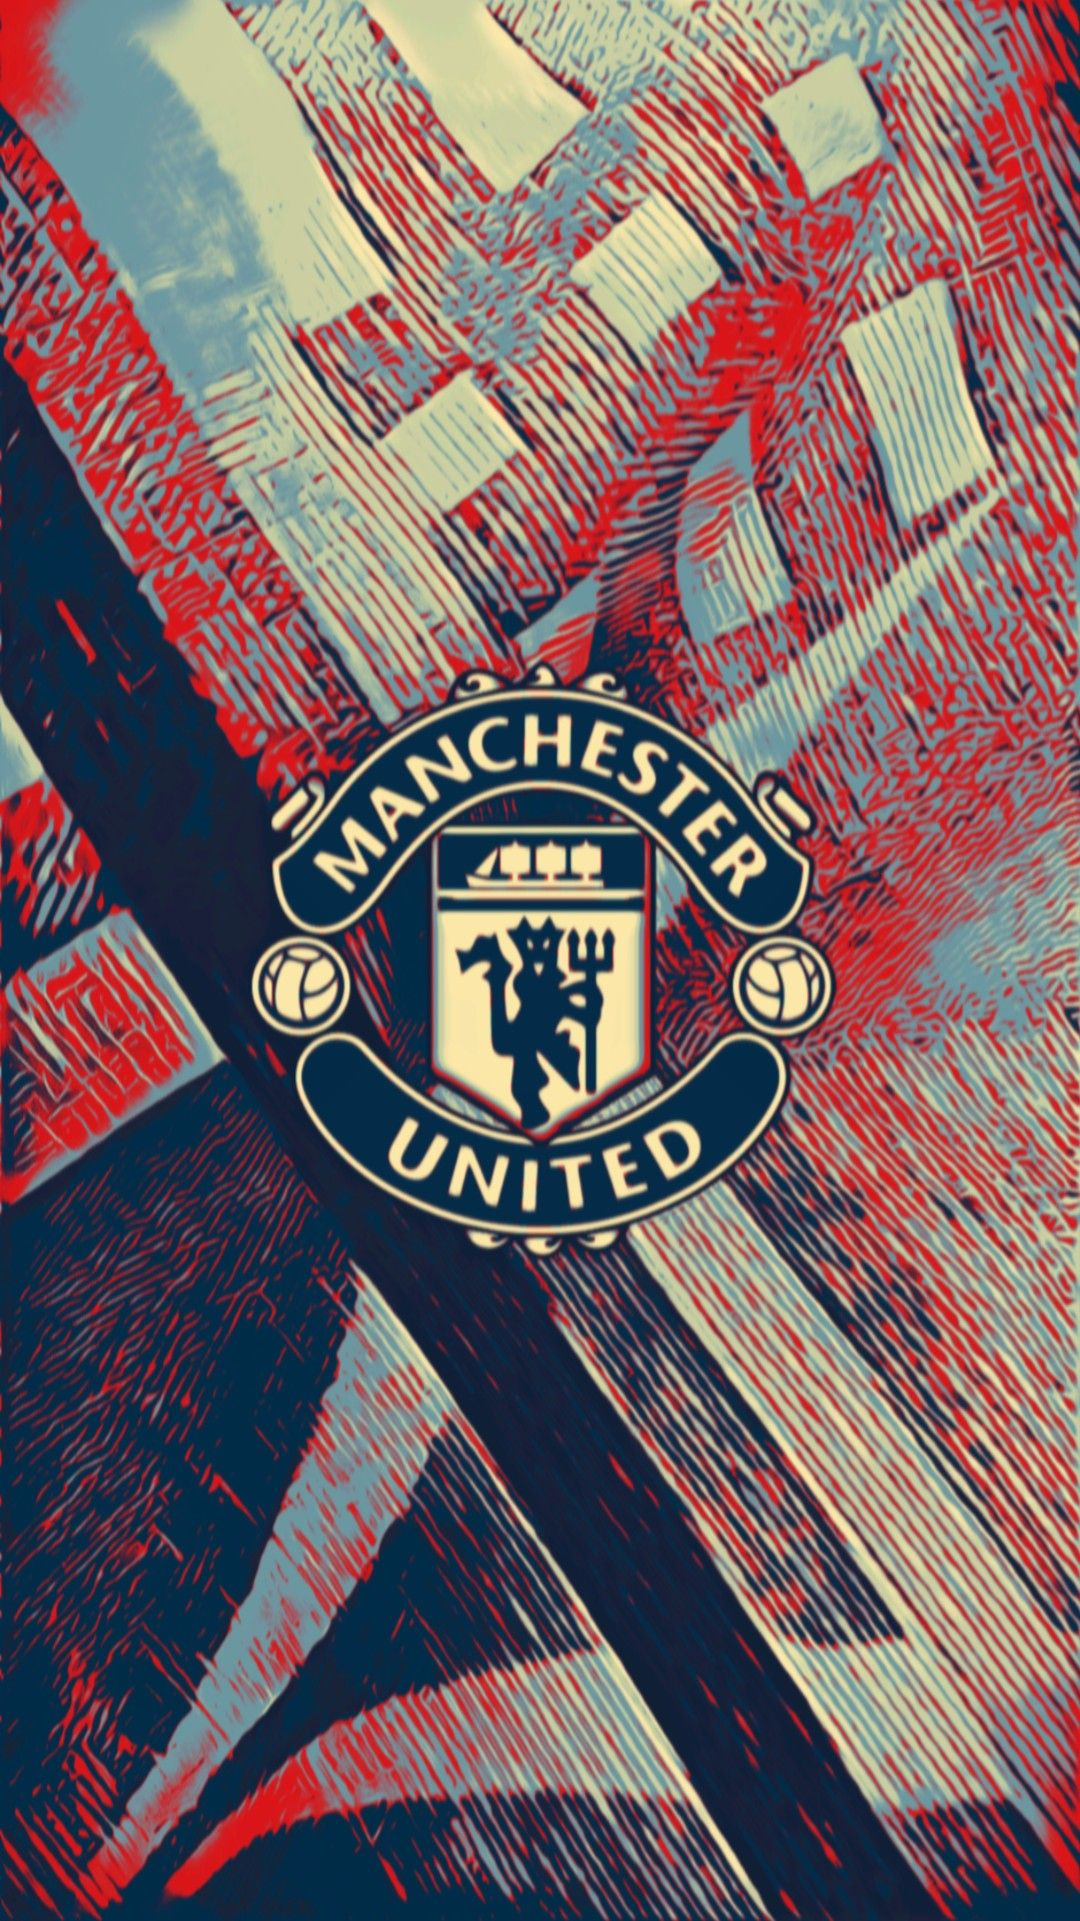 Manchester United Gambar Sepak Bola Sepak Bola Wallpaper Ponsel